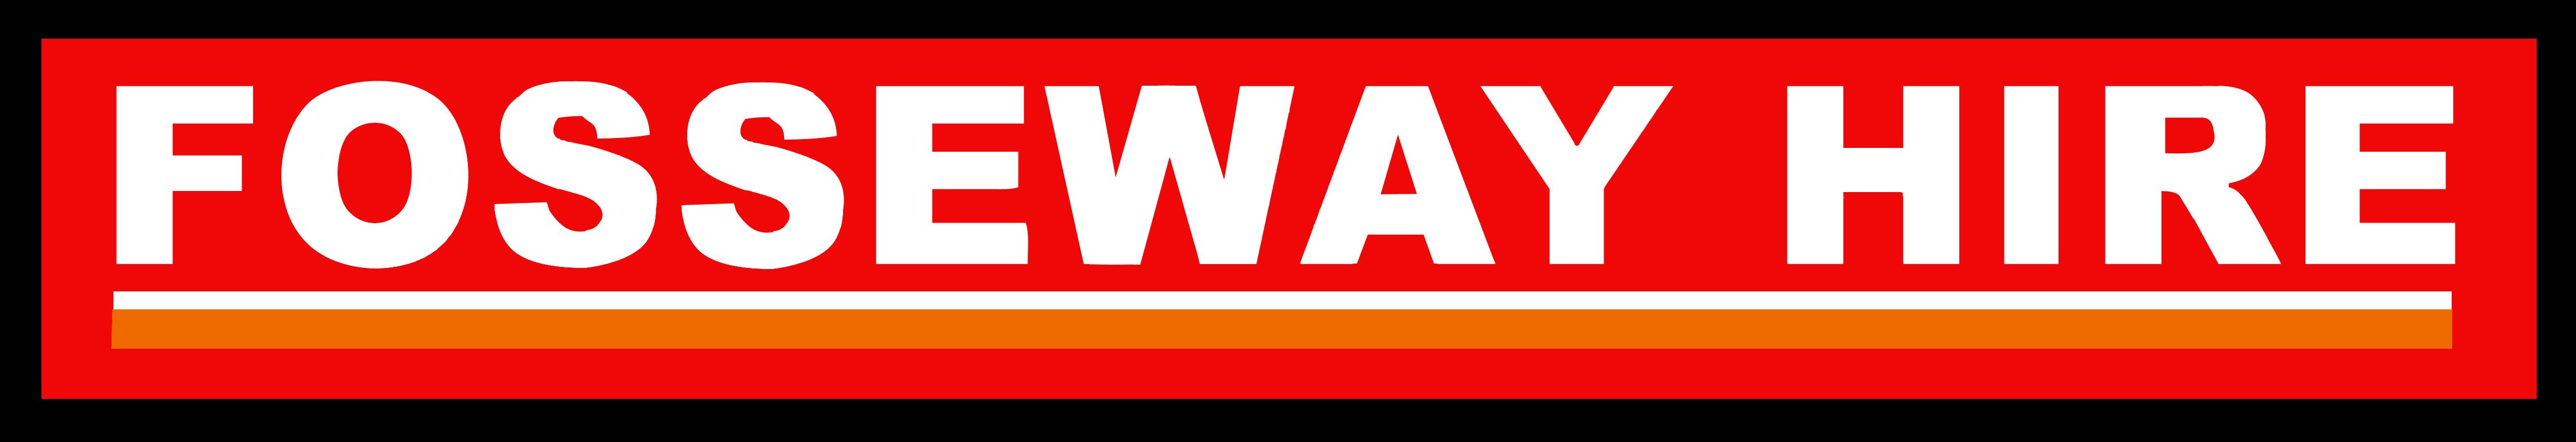 Fosseway Hire